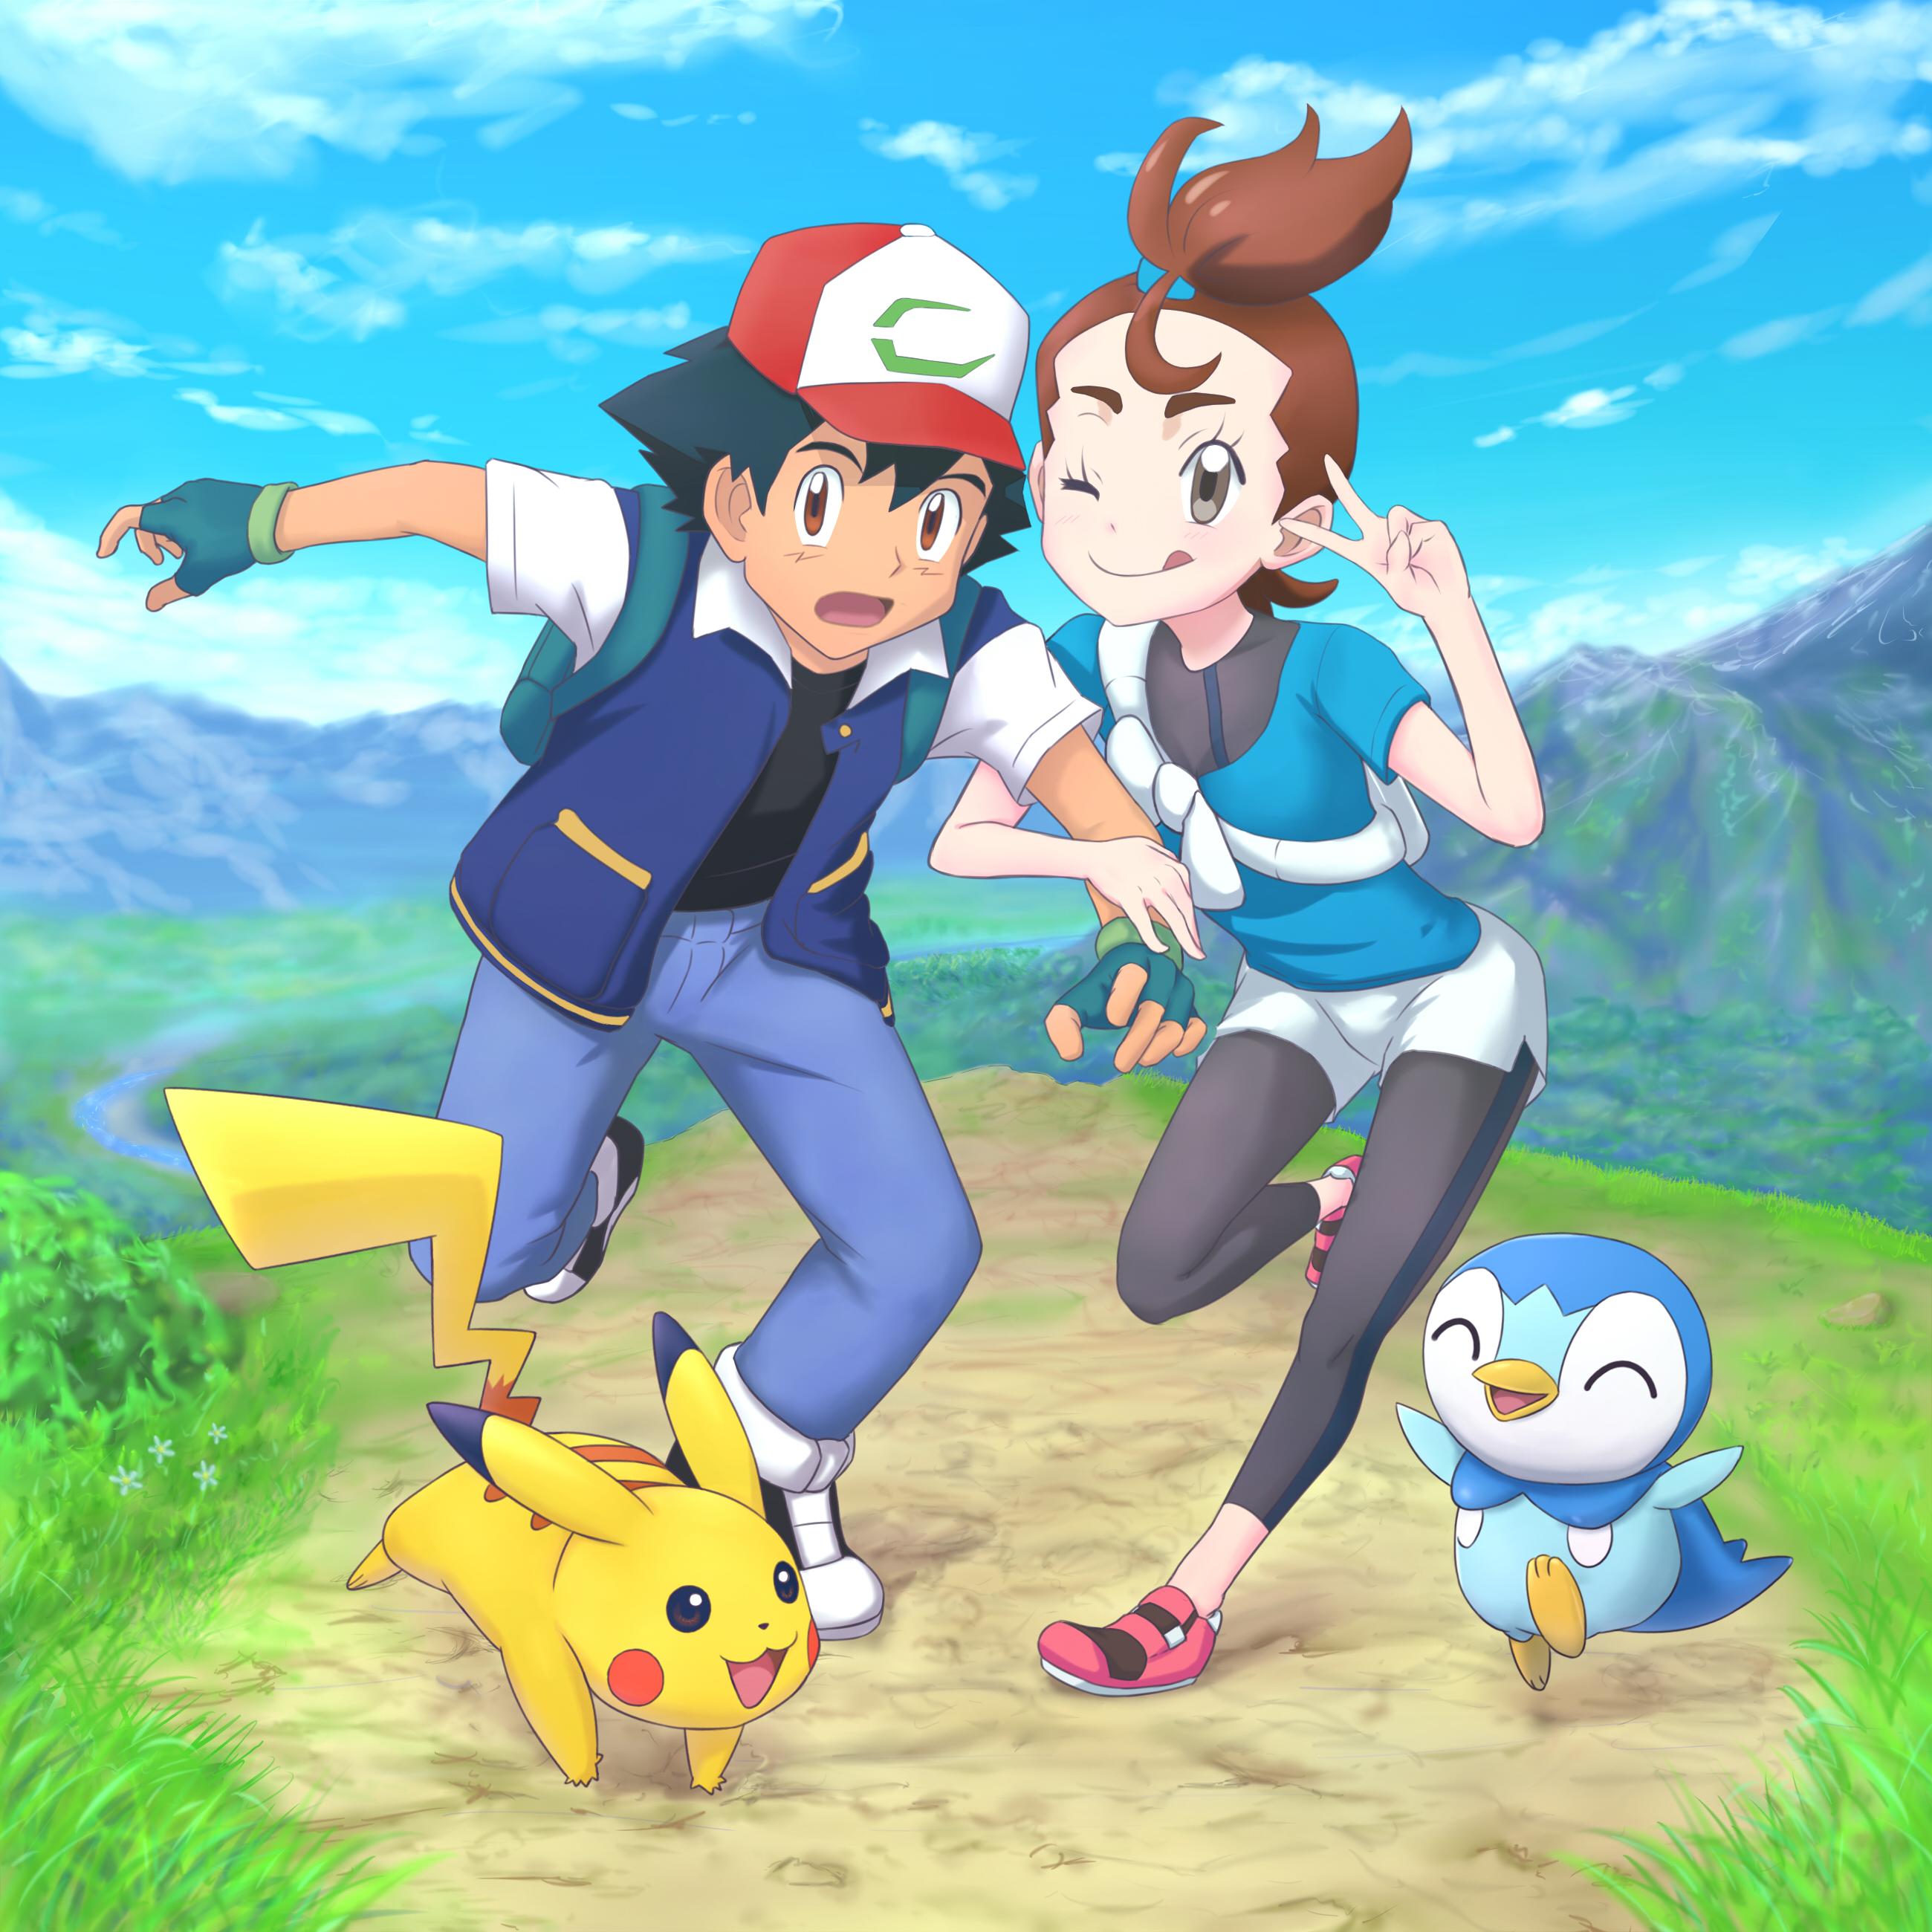 Pok 233 Mon The Movie I Choose You Image 2126744 Zerochan Anime Image Board